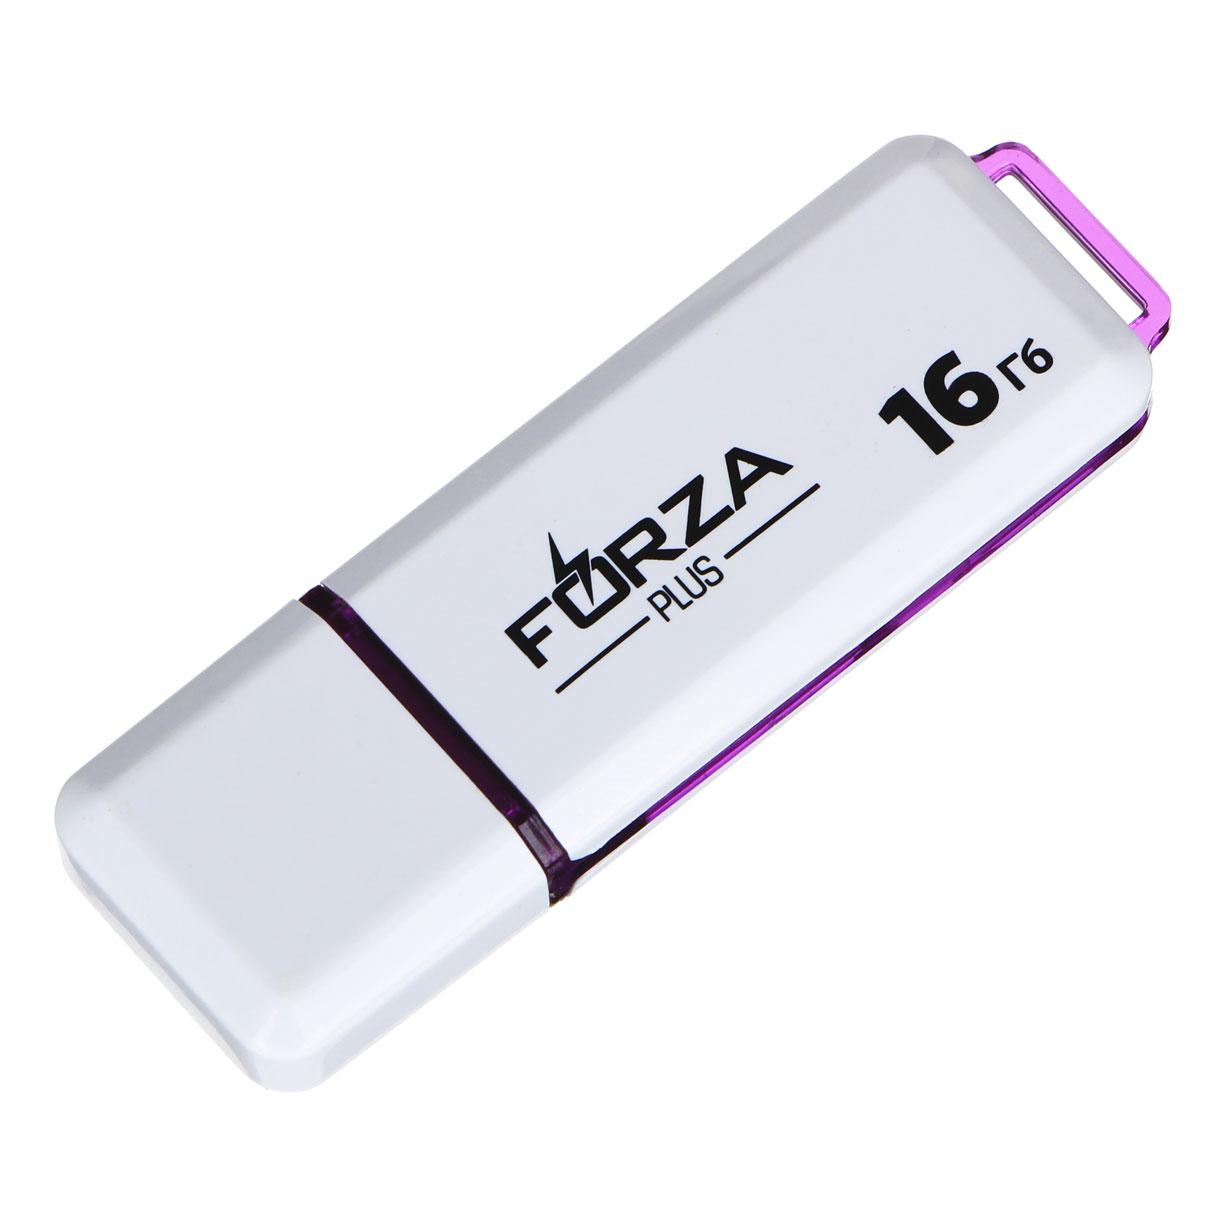 FORZA Флеш-карта, 16 гб, 6 класс, блистер, пластик, цвет белый